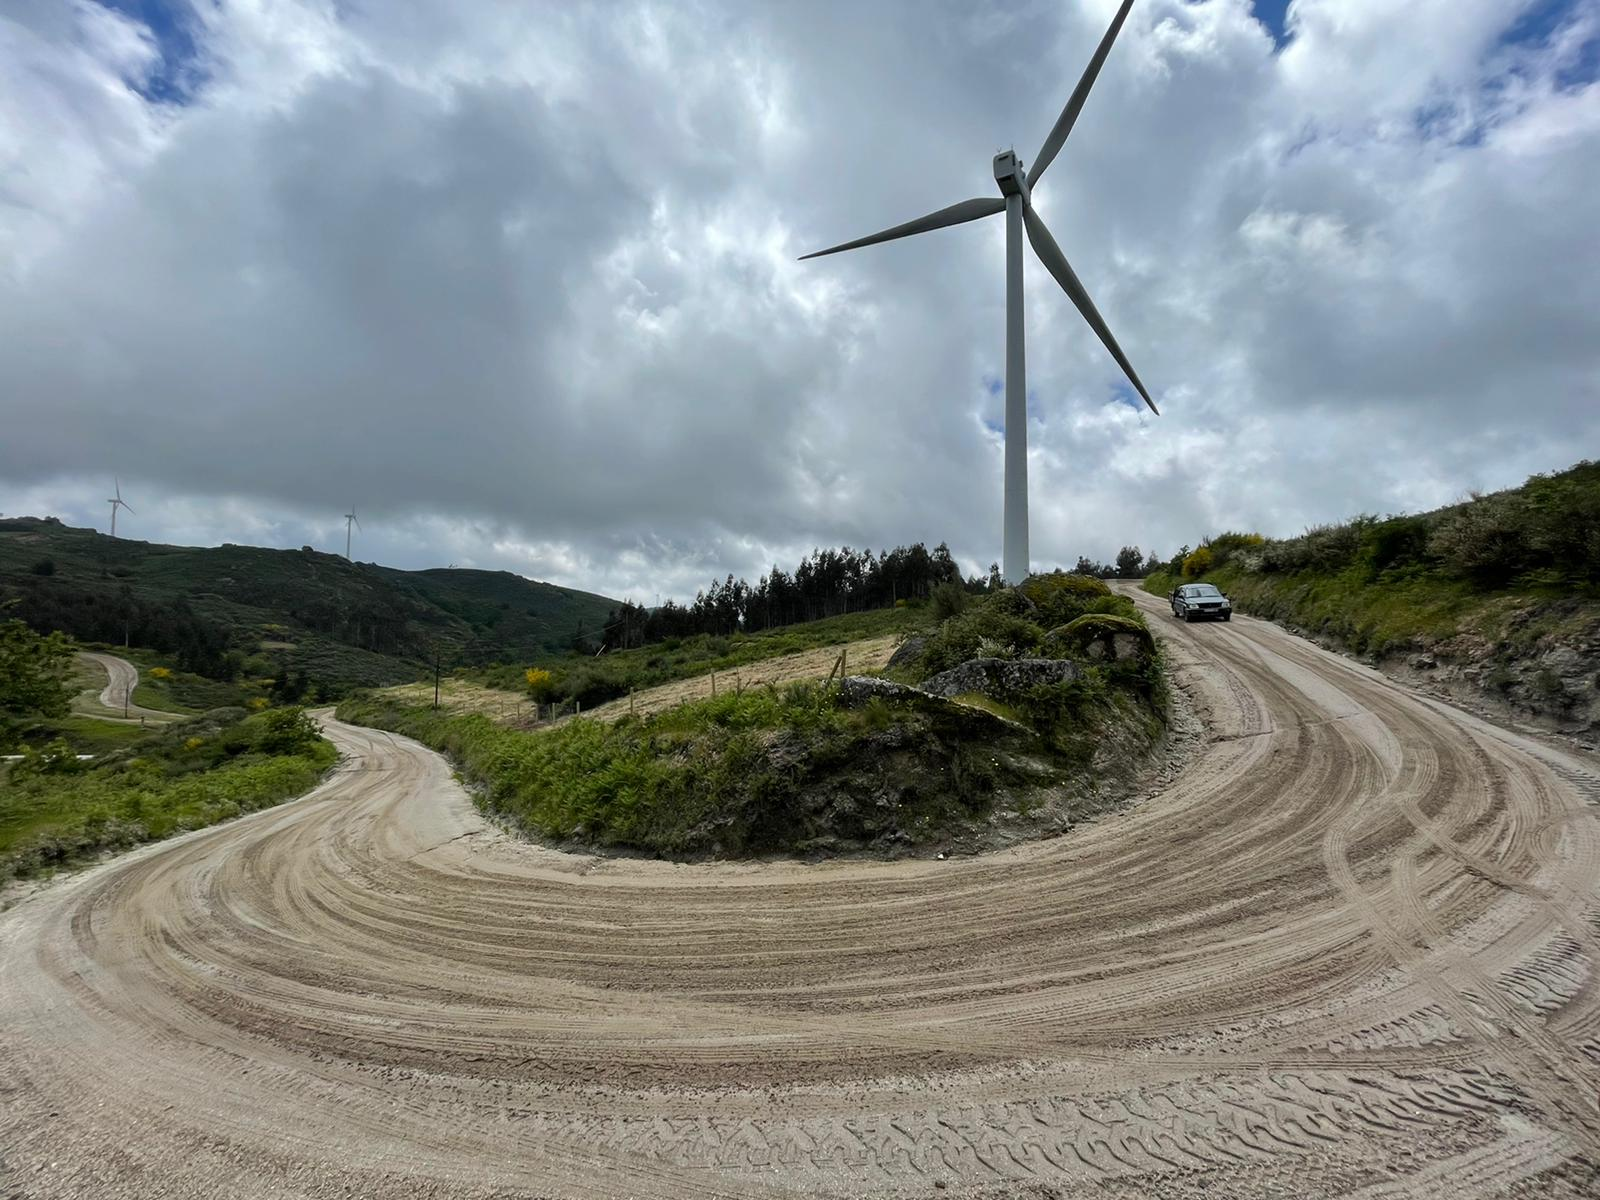 WRC: 54º Vodafone Rallye de Portugal [20-23 de Mayo] E1wojYyWUAMmN4J?format=jpg&name=large